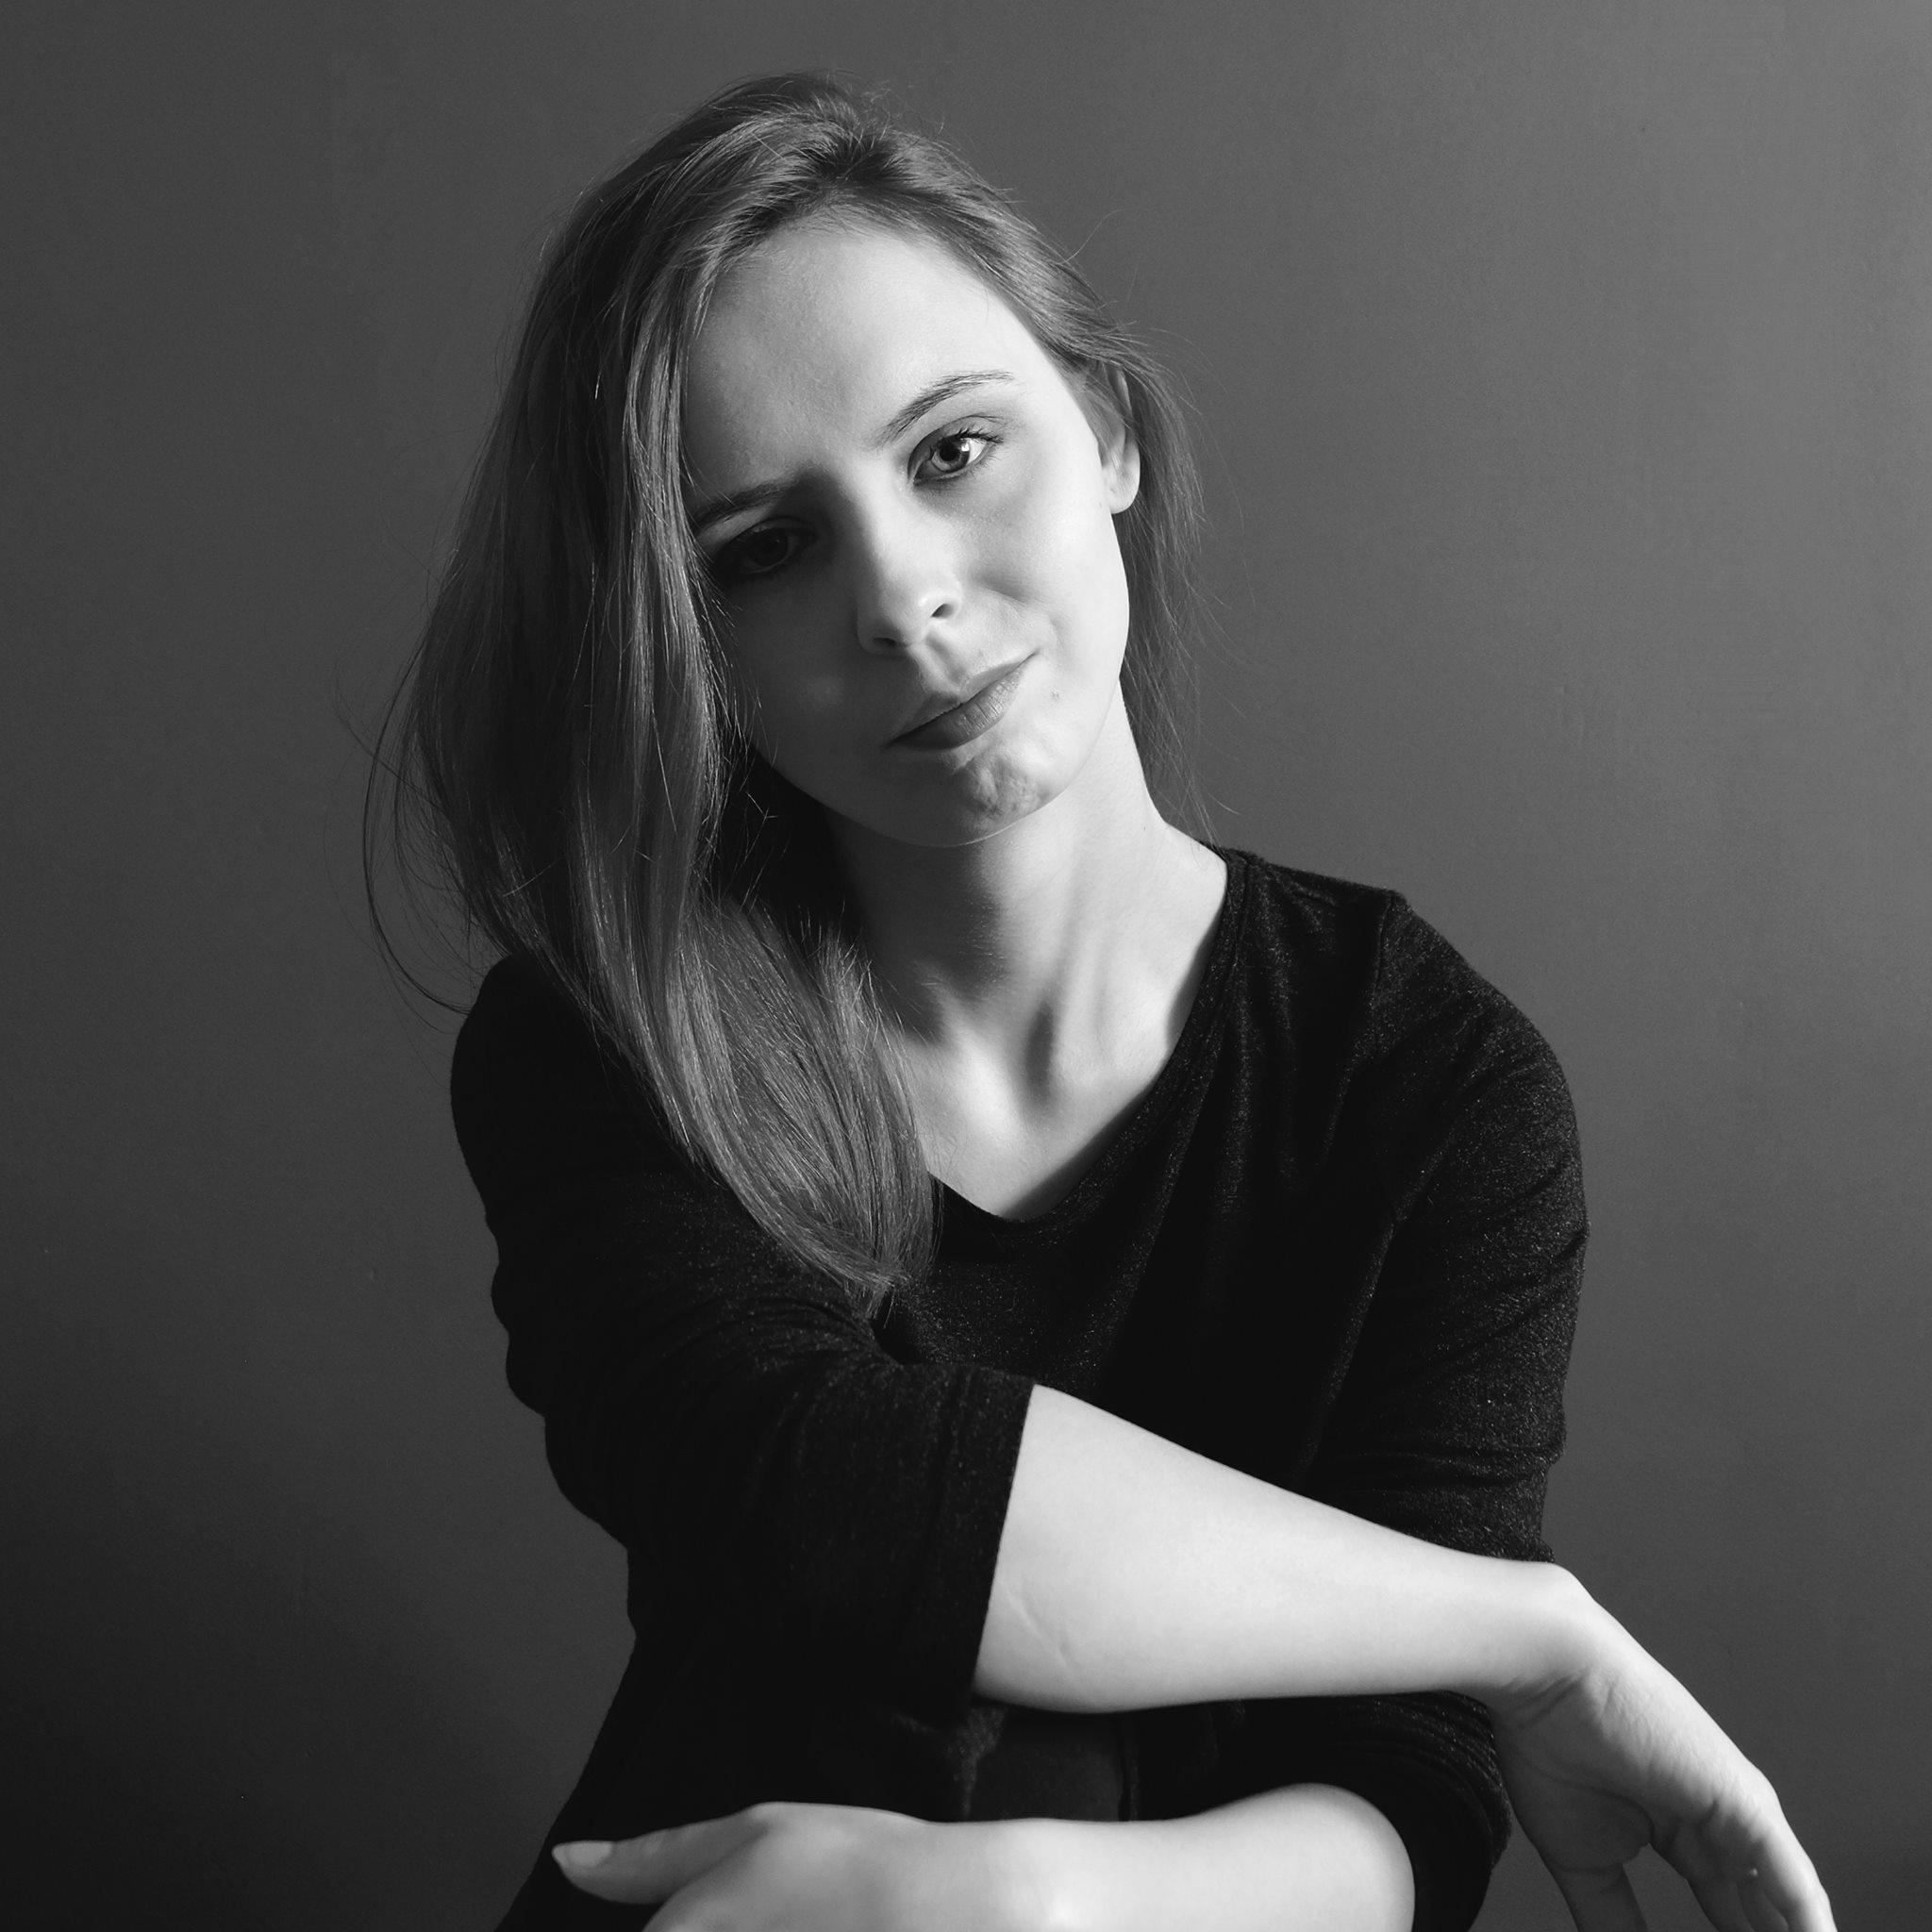 Agnieszka Lniak